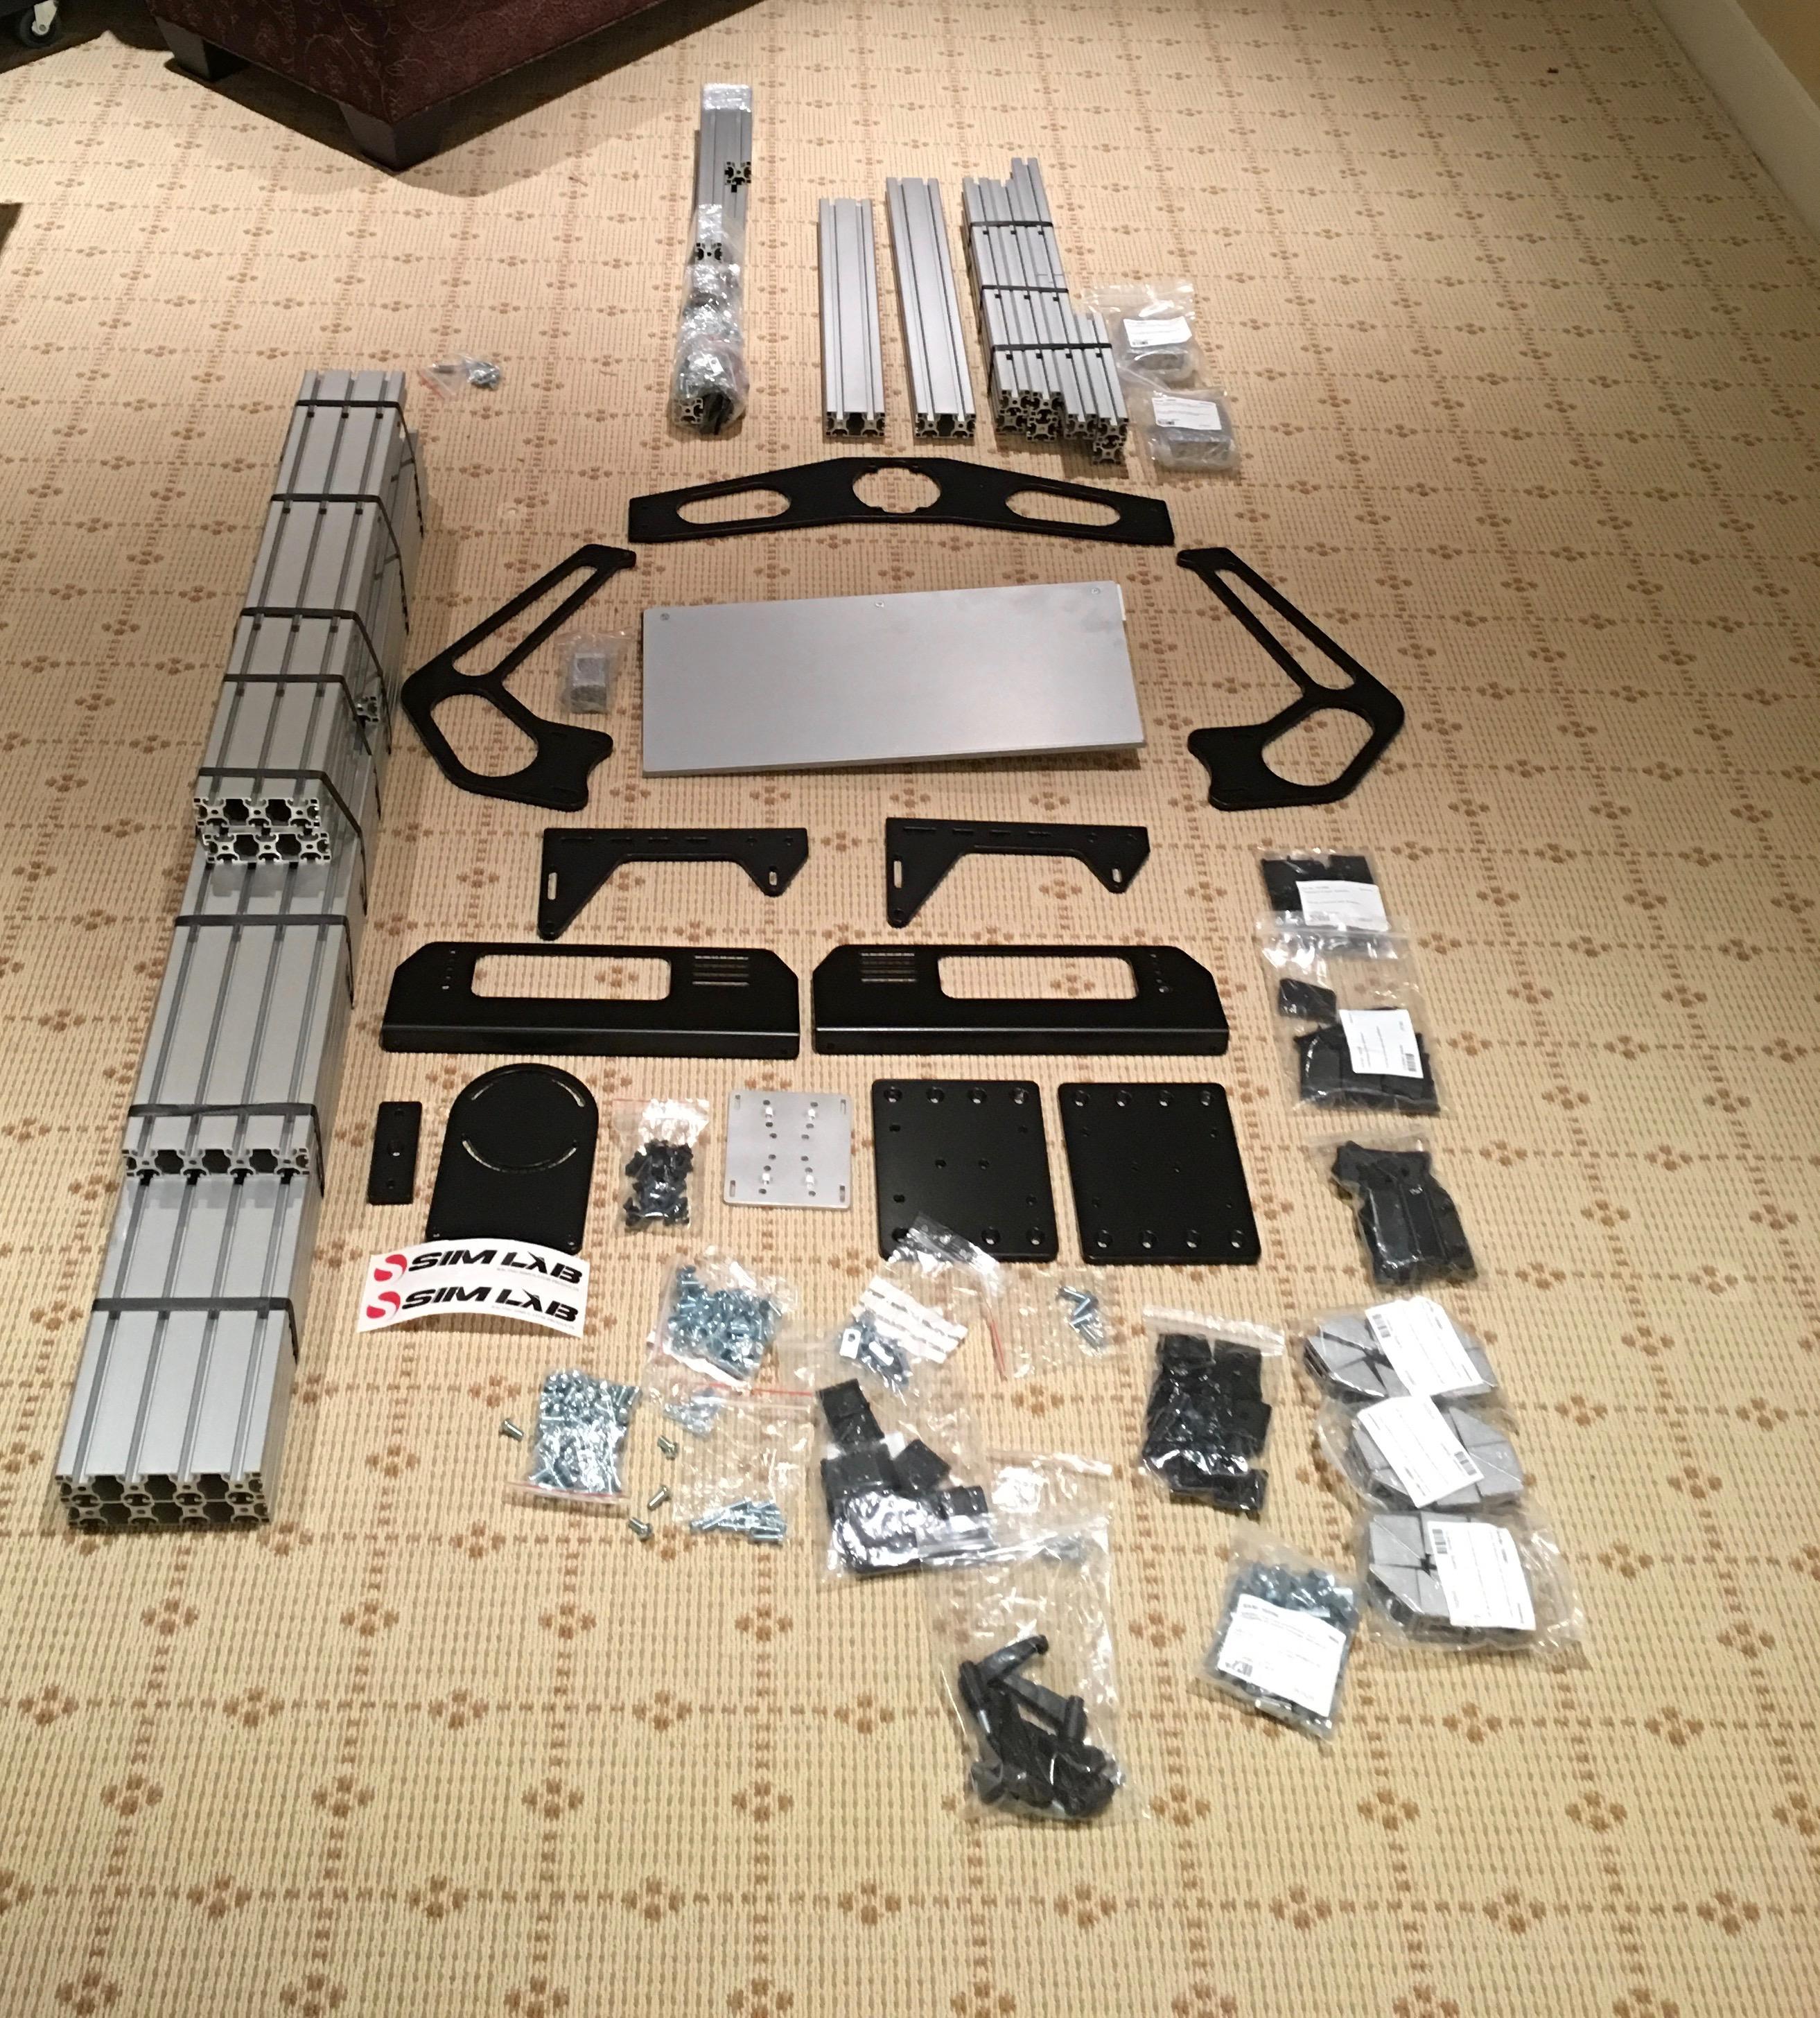 SIM-LAB P1 Build/Review - Racing Rig Reviews - InsideSimRacing Forums